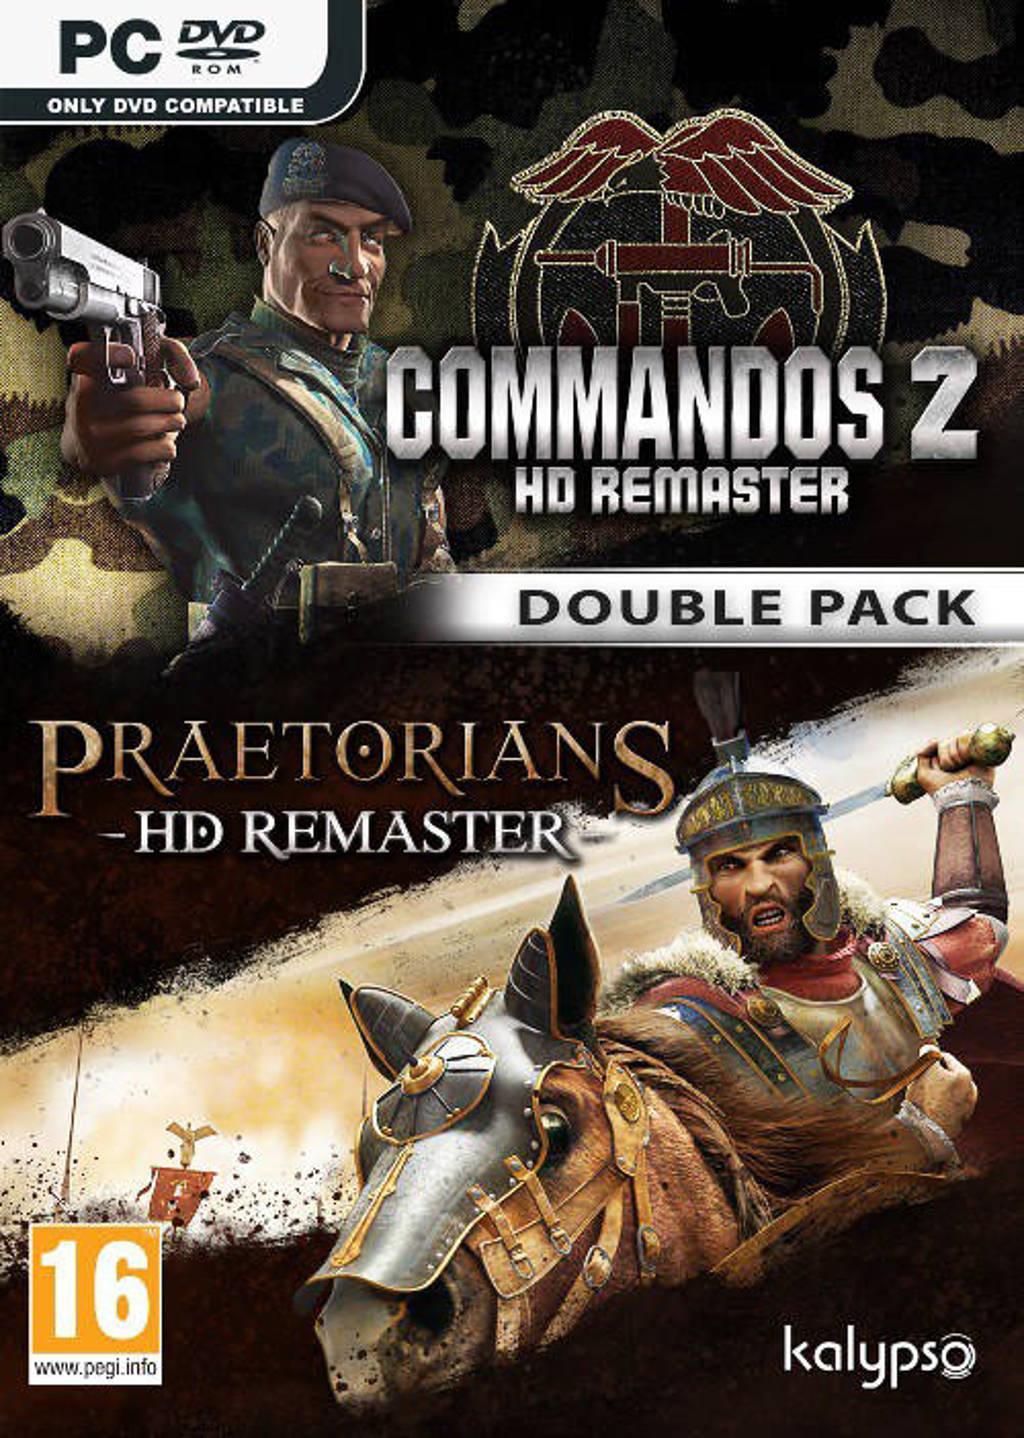 Commandos 2 & praetorians - HD Remaster double pack (PC)